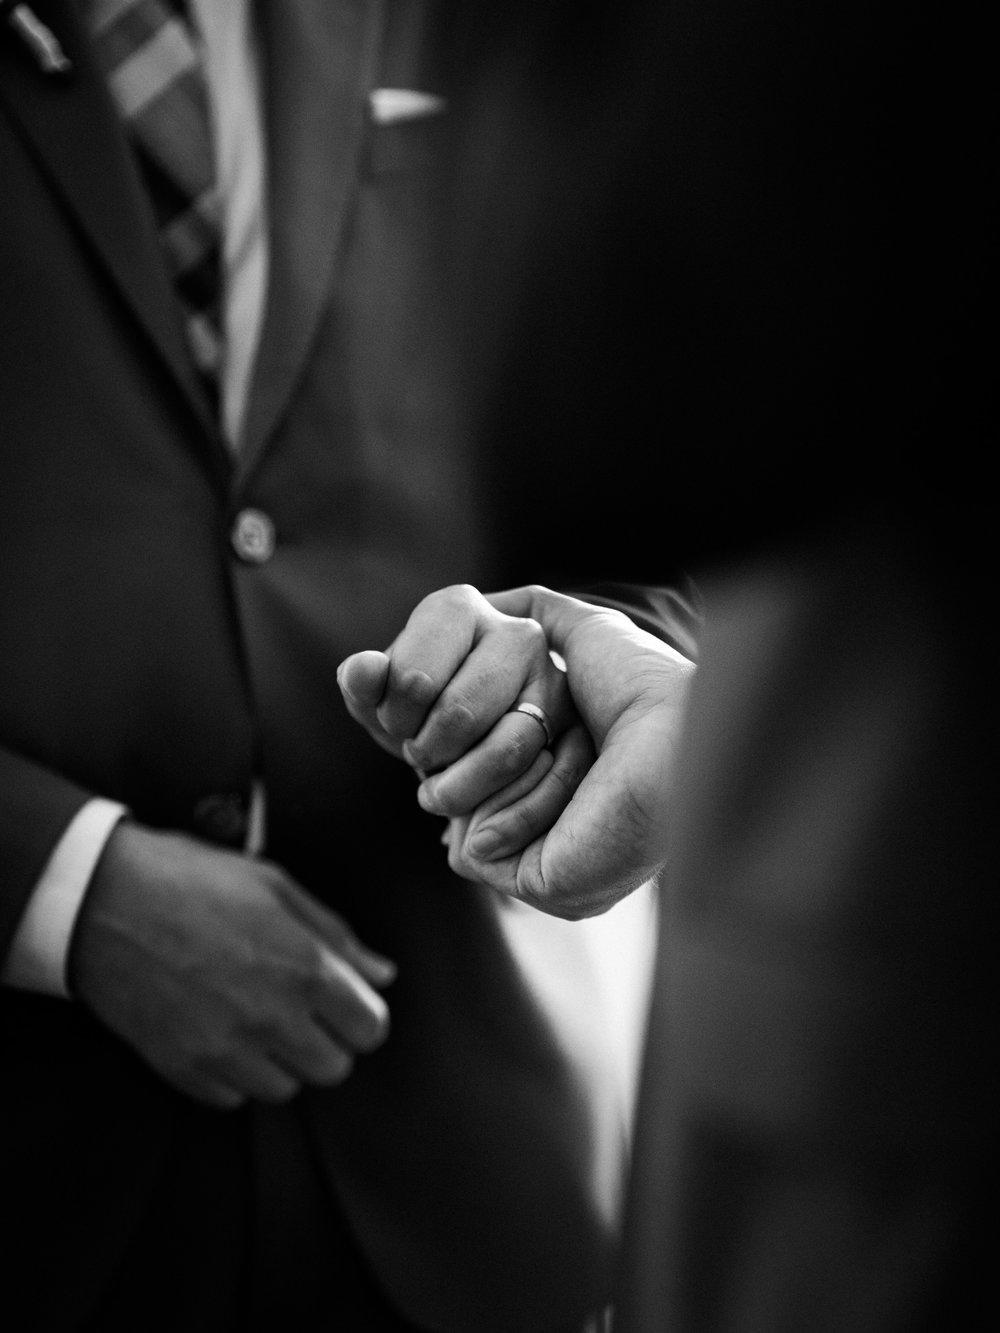 toronto-island-Royal-canadian-yacht-club-wedding-photographer-25